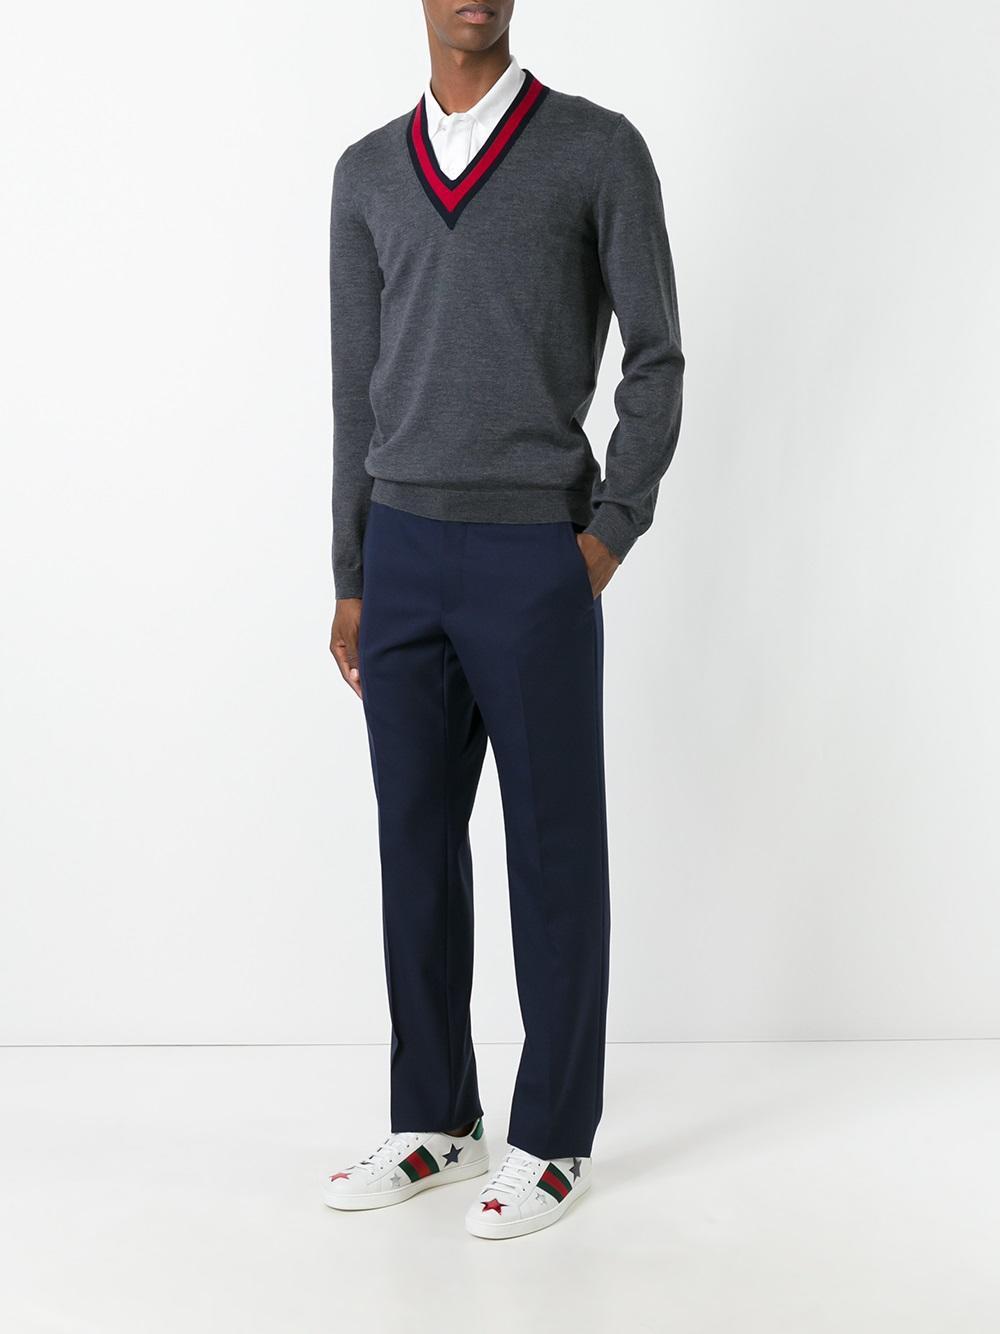 Gucci Wool Web Trim V Neck Jumper In Grey Gray For Men